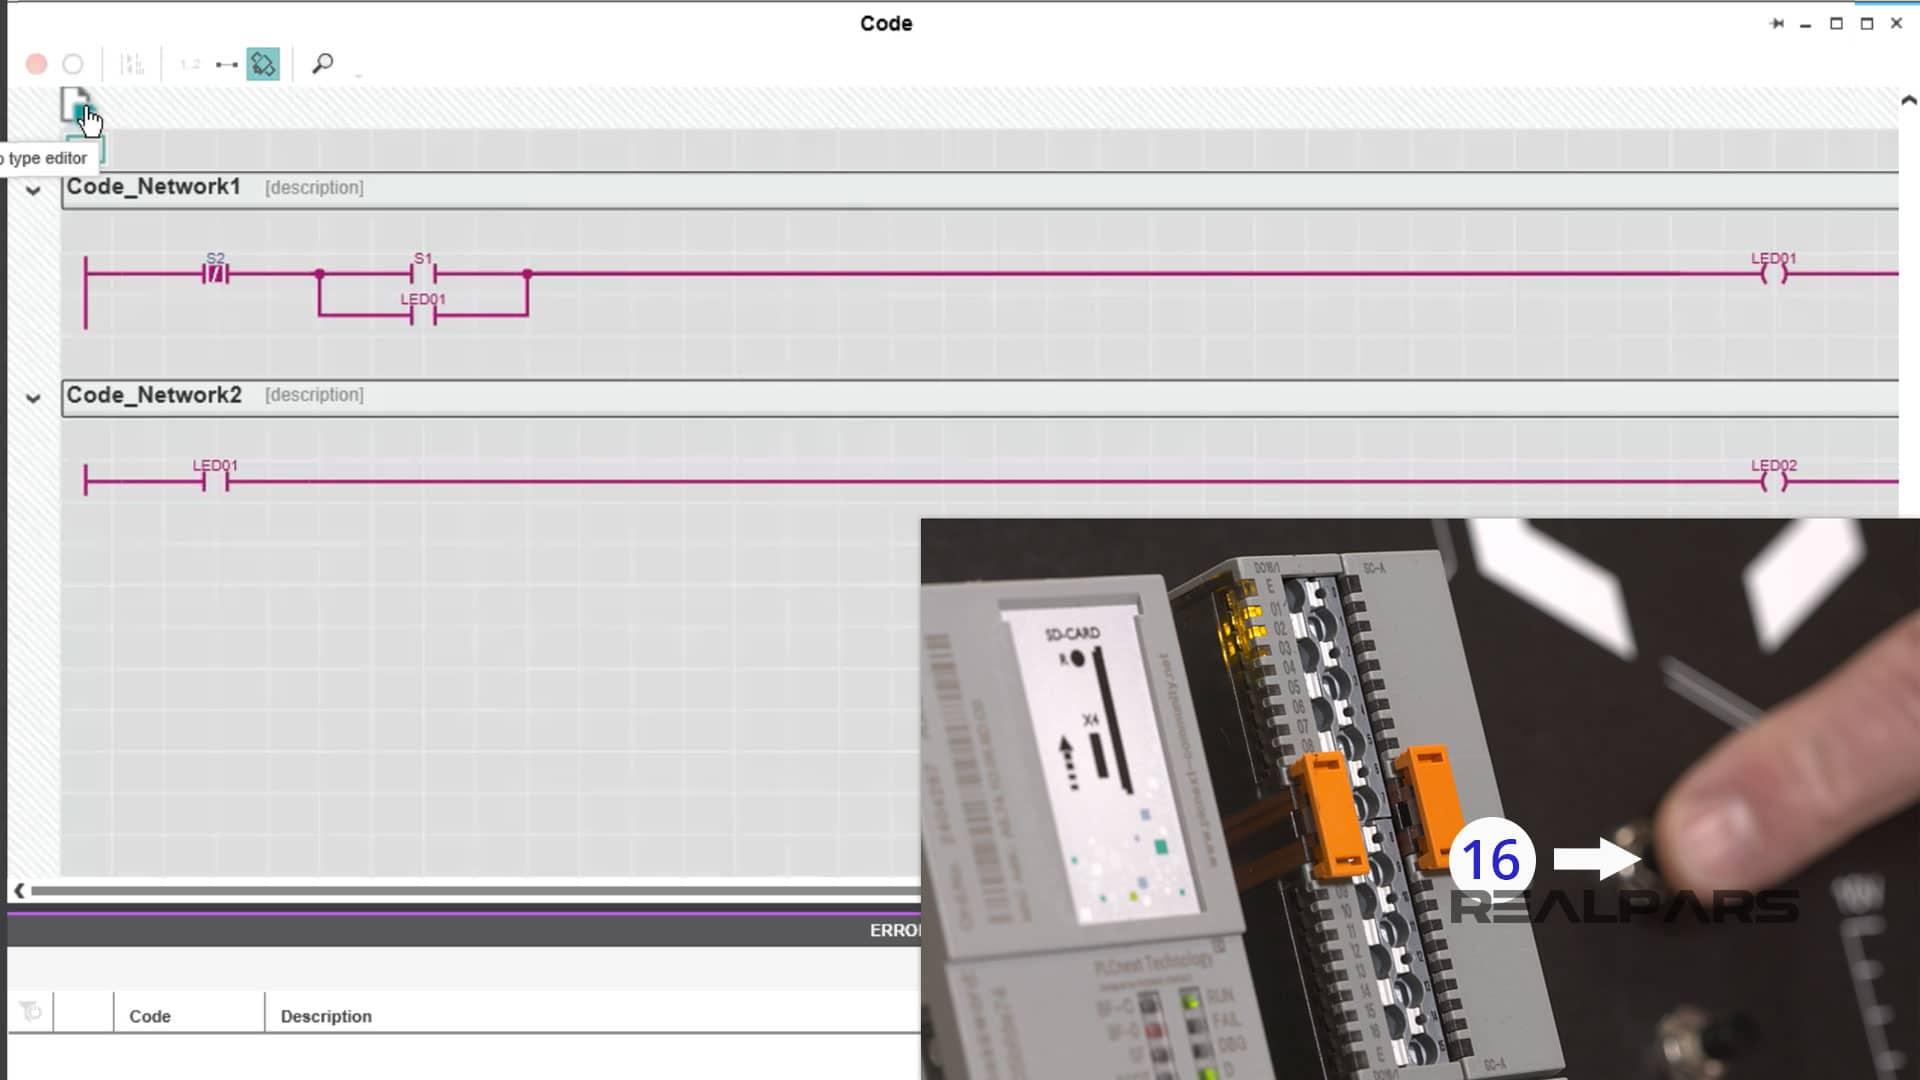 Monitor The Program Test - S1